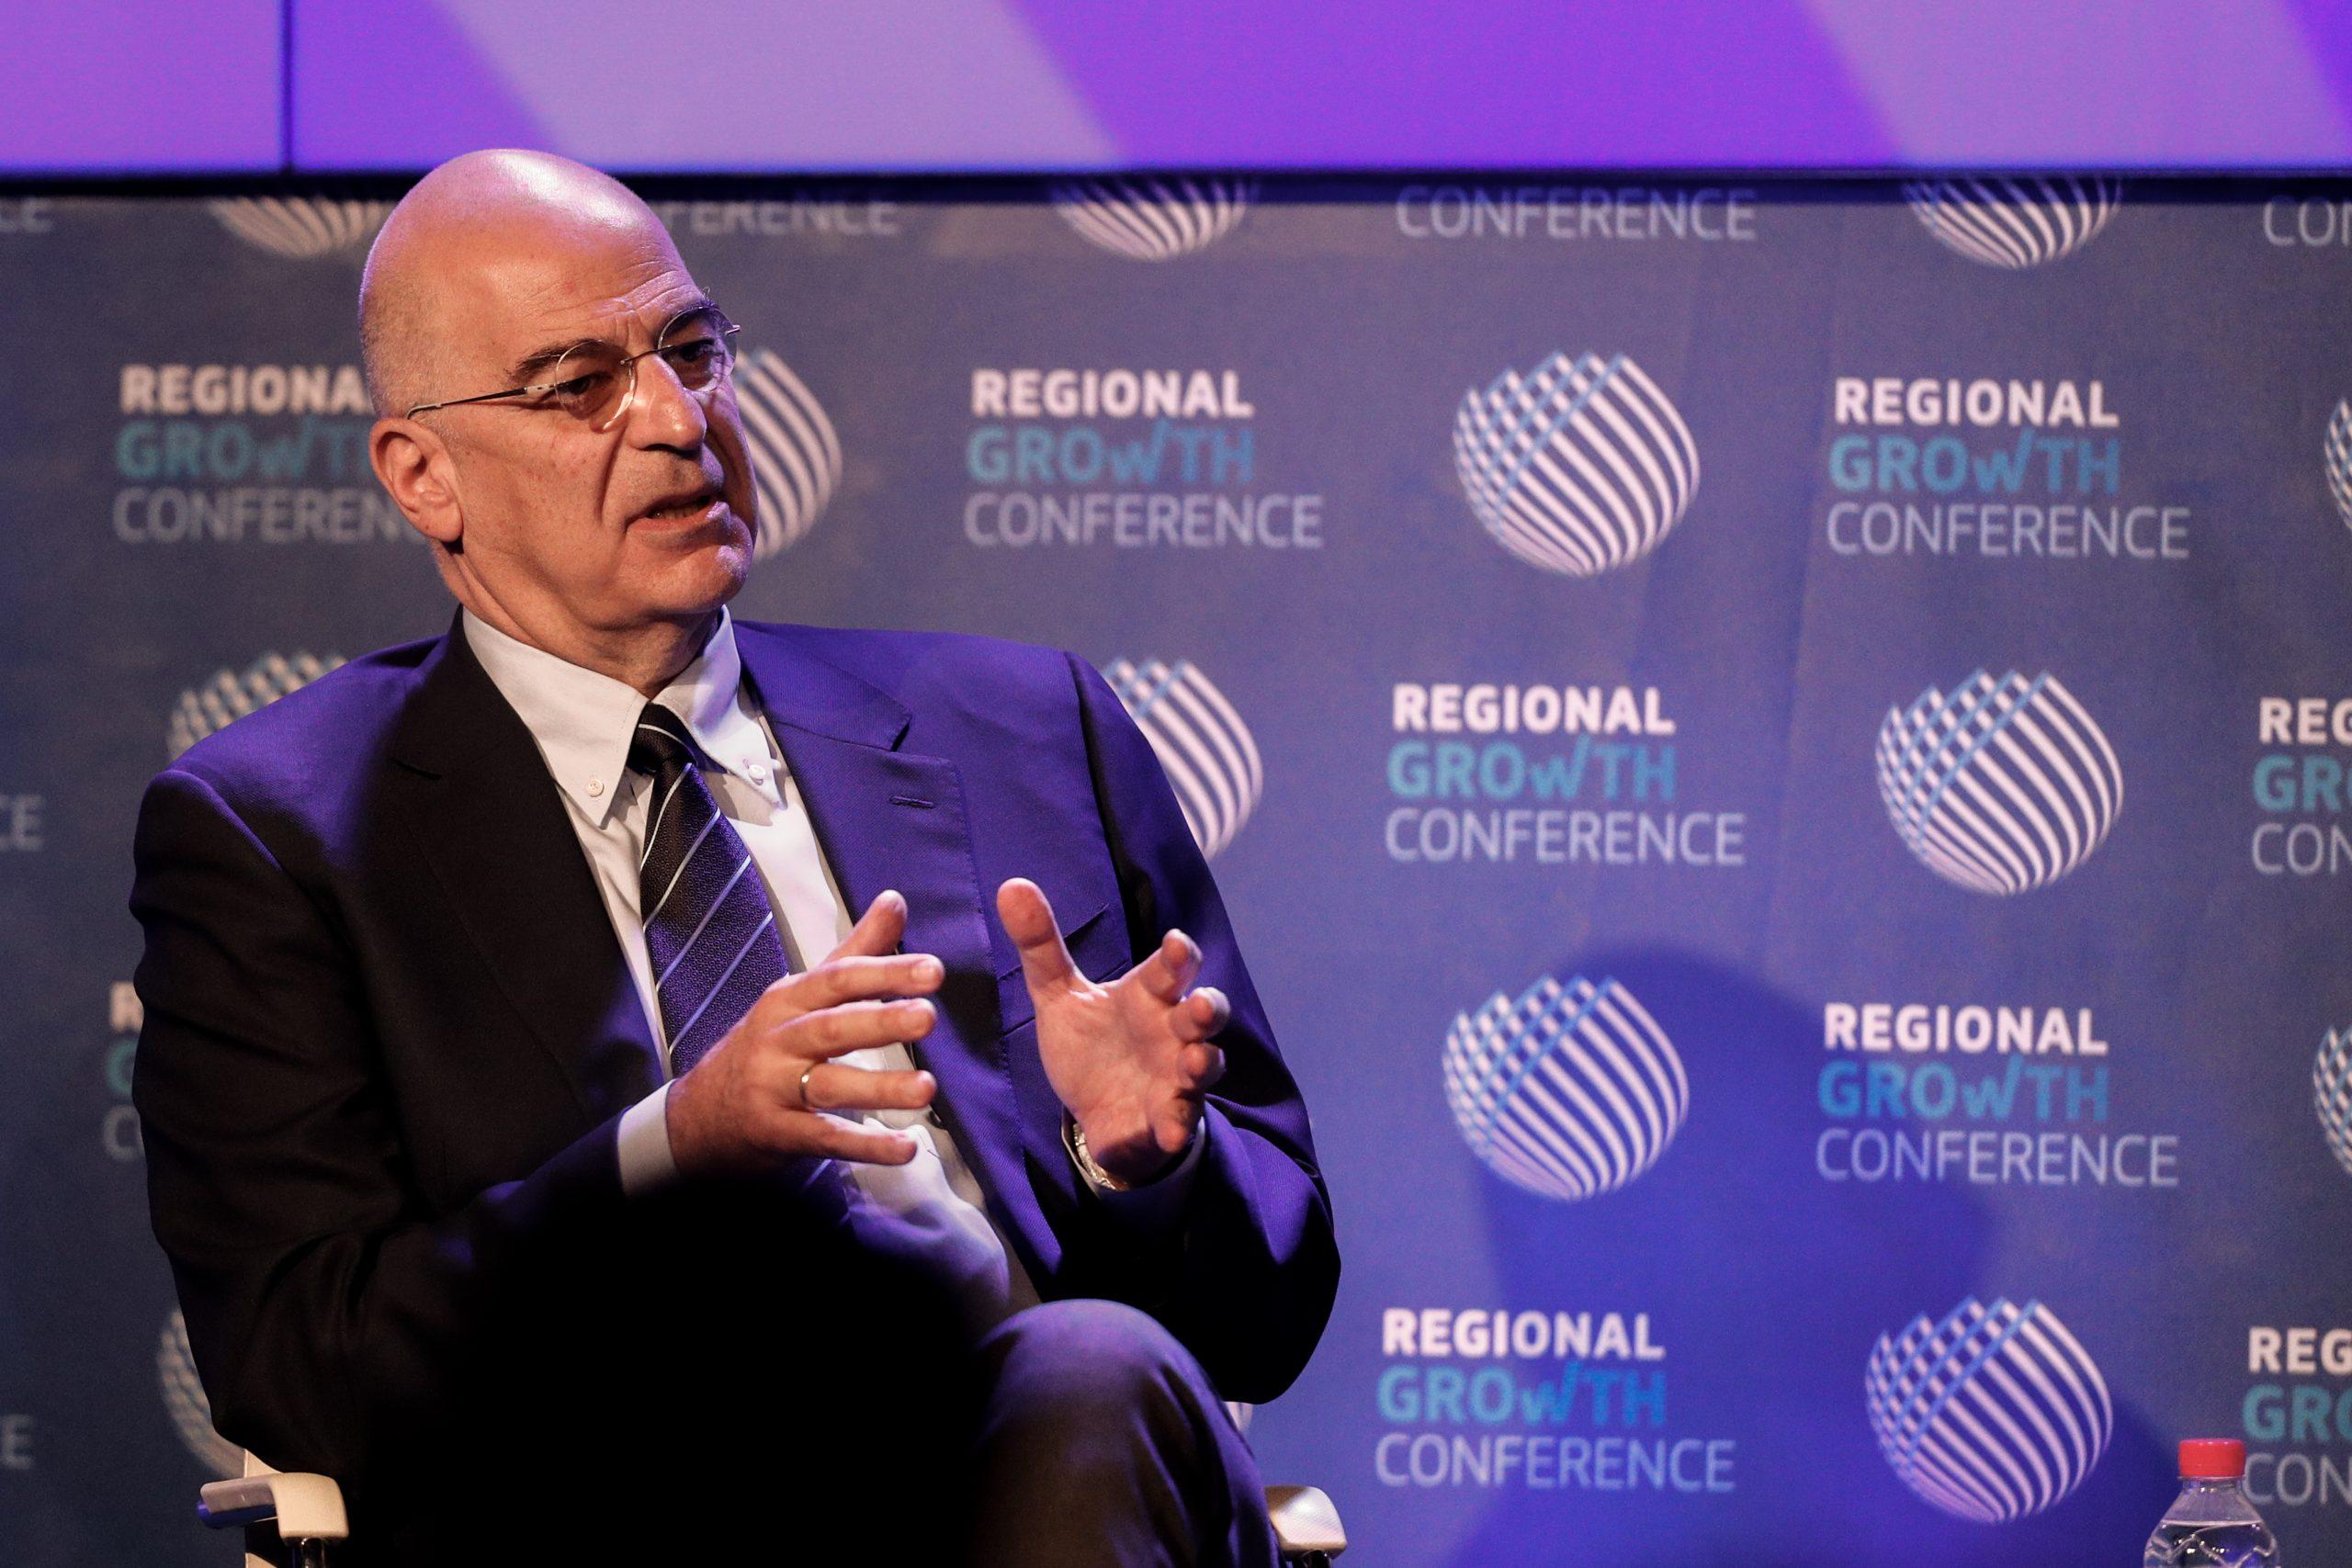 Regional Growth Conference – Ν. Δένδιας: Δεν υπάρχει καμία πιθανότητα να αποστούμε από τις πάγιες εθνικές θέσεις